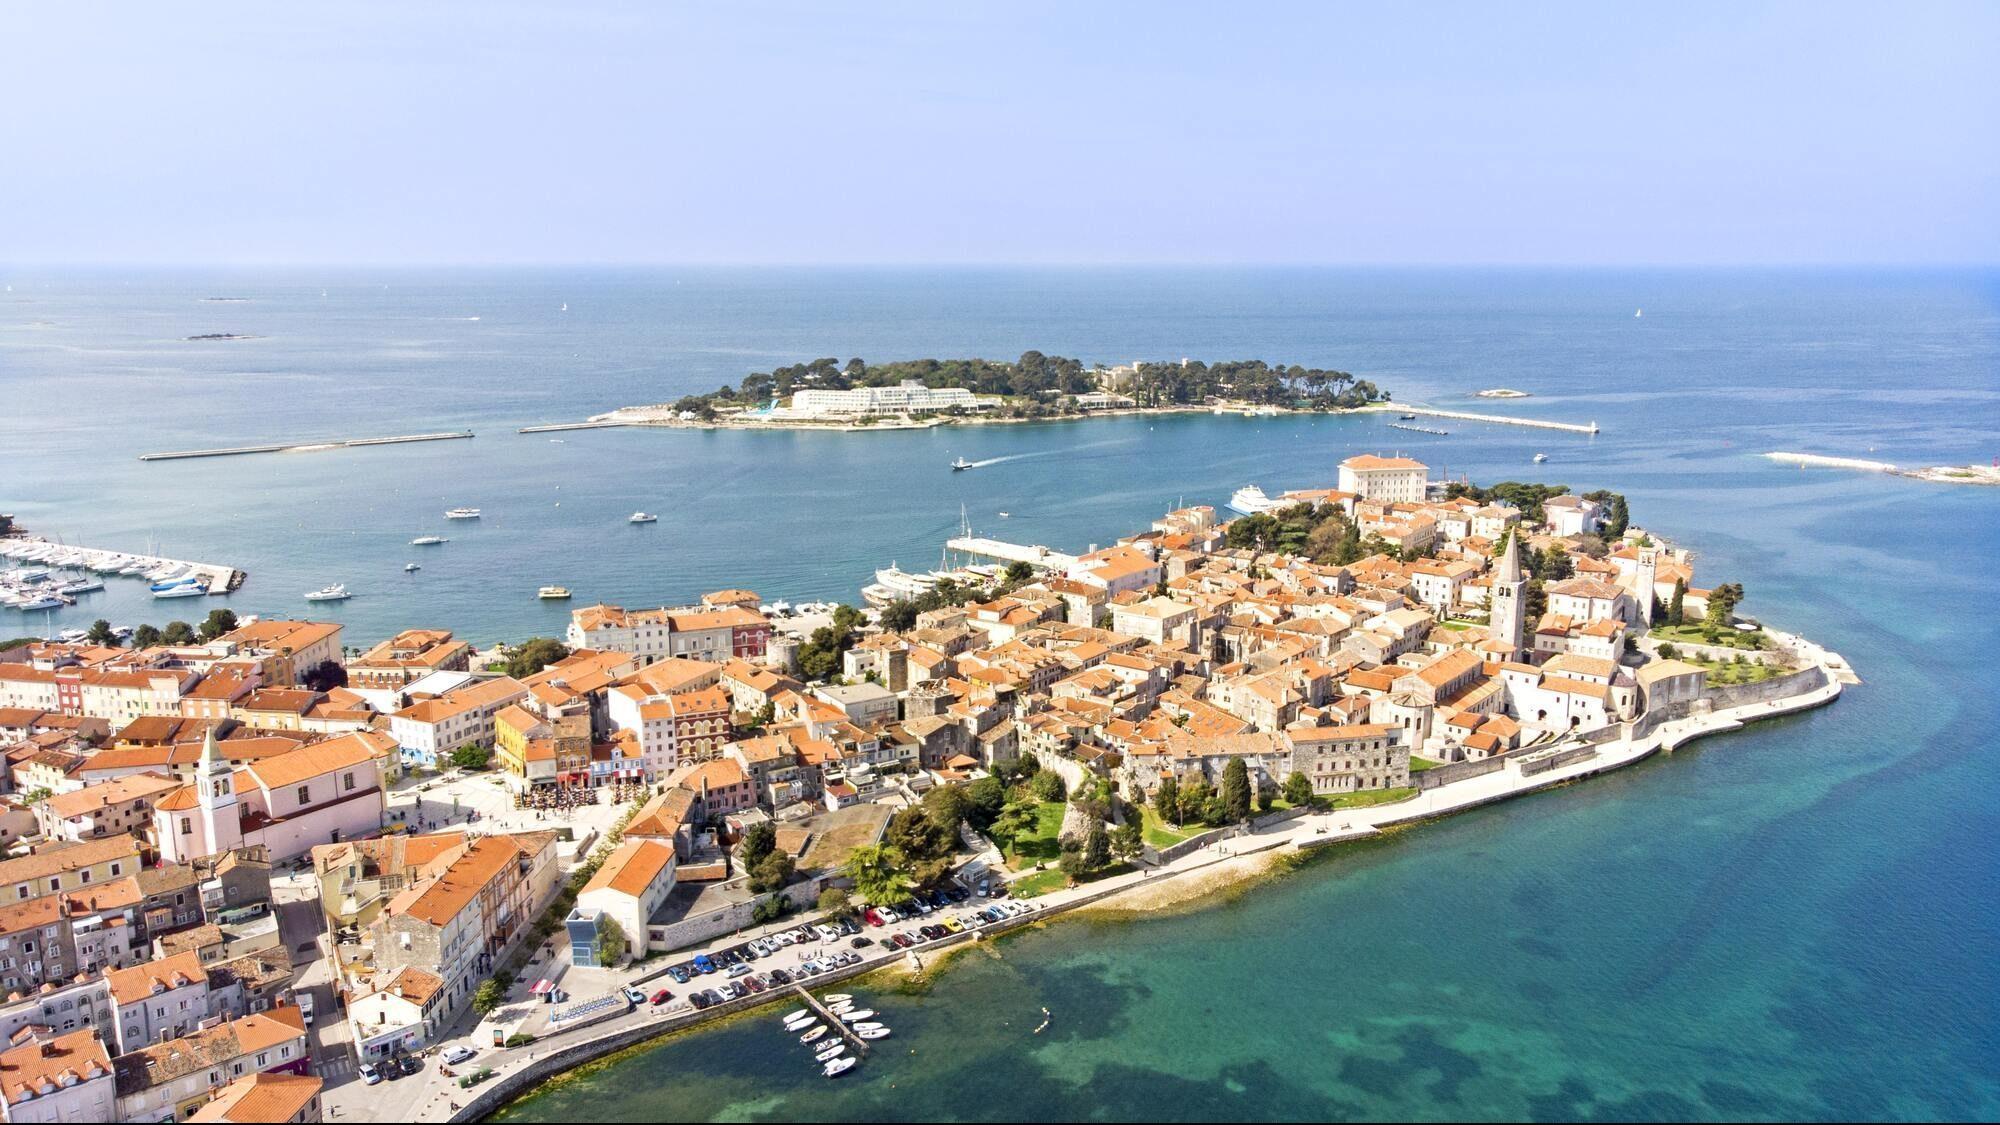 10th International festival of choirs and orchestras in Poreč (Istria, Croatia)